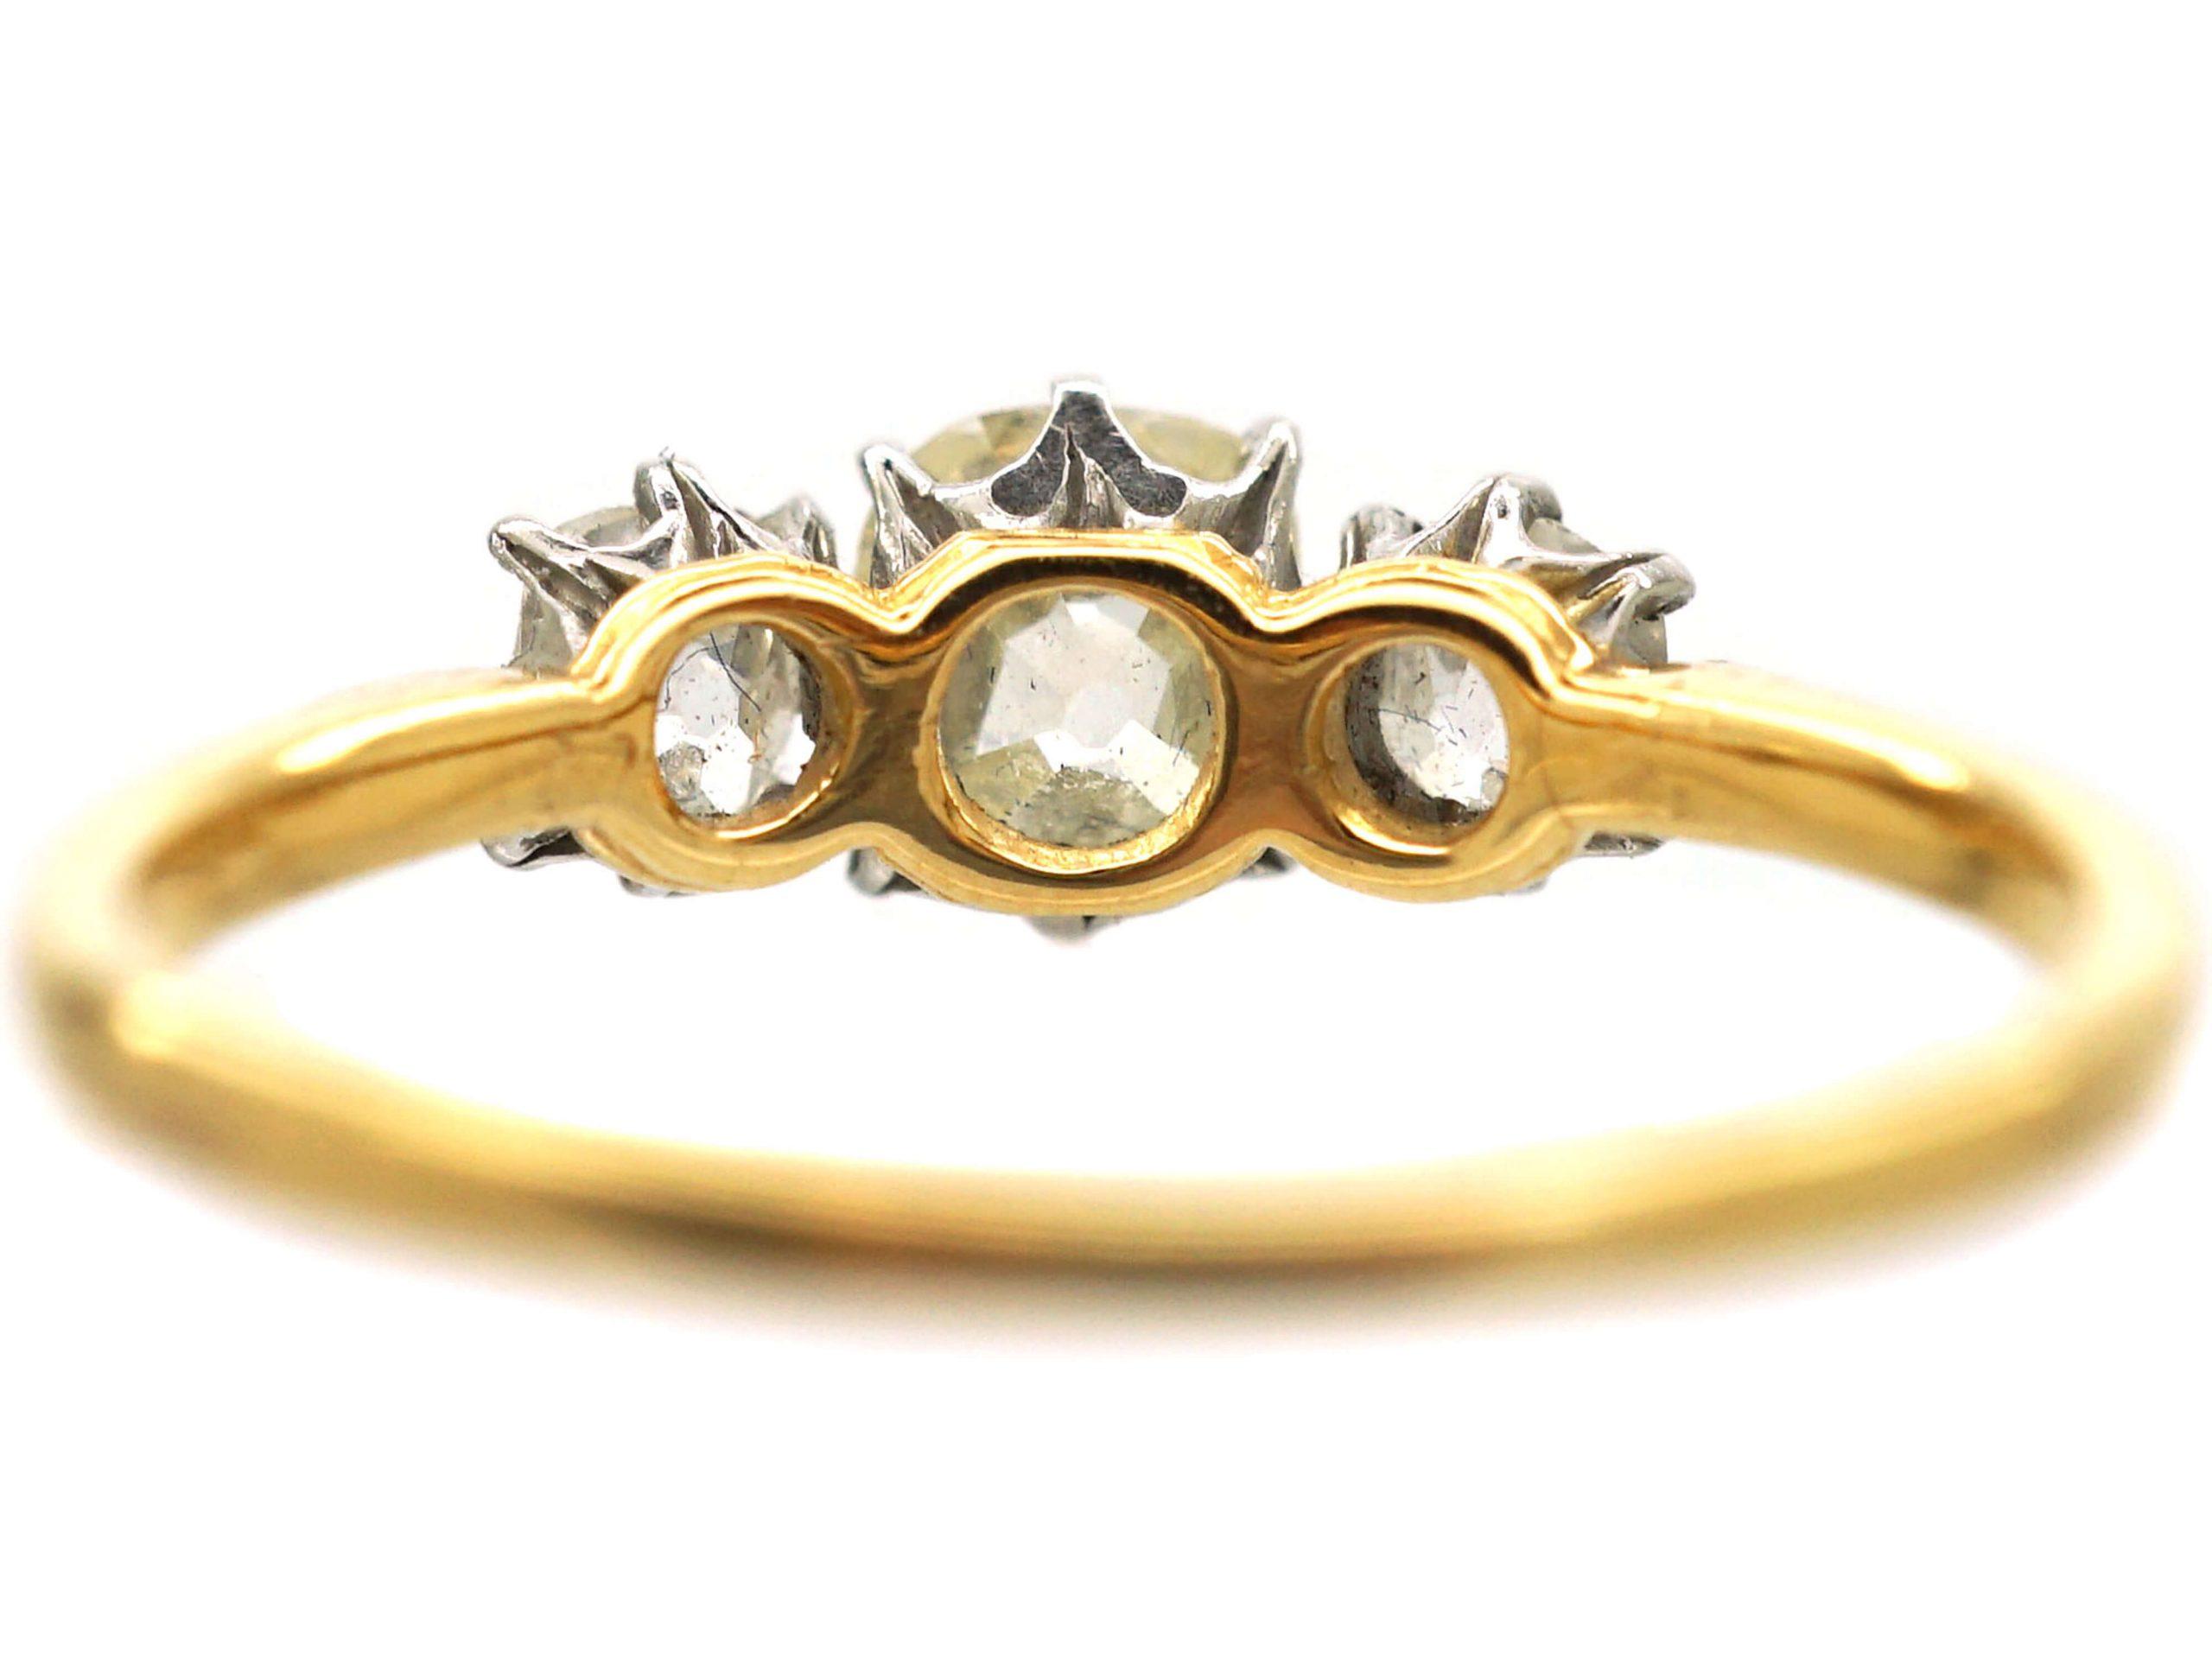 Edwardian 18ct Gold, Three Stone Old Mine Cut Diamond Ring